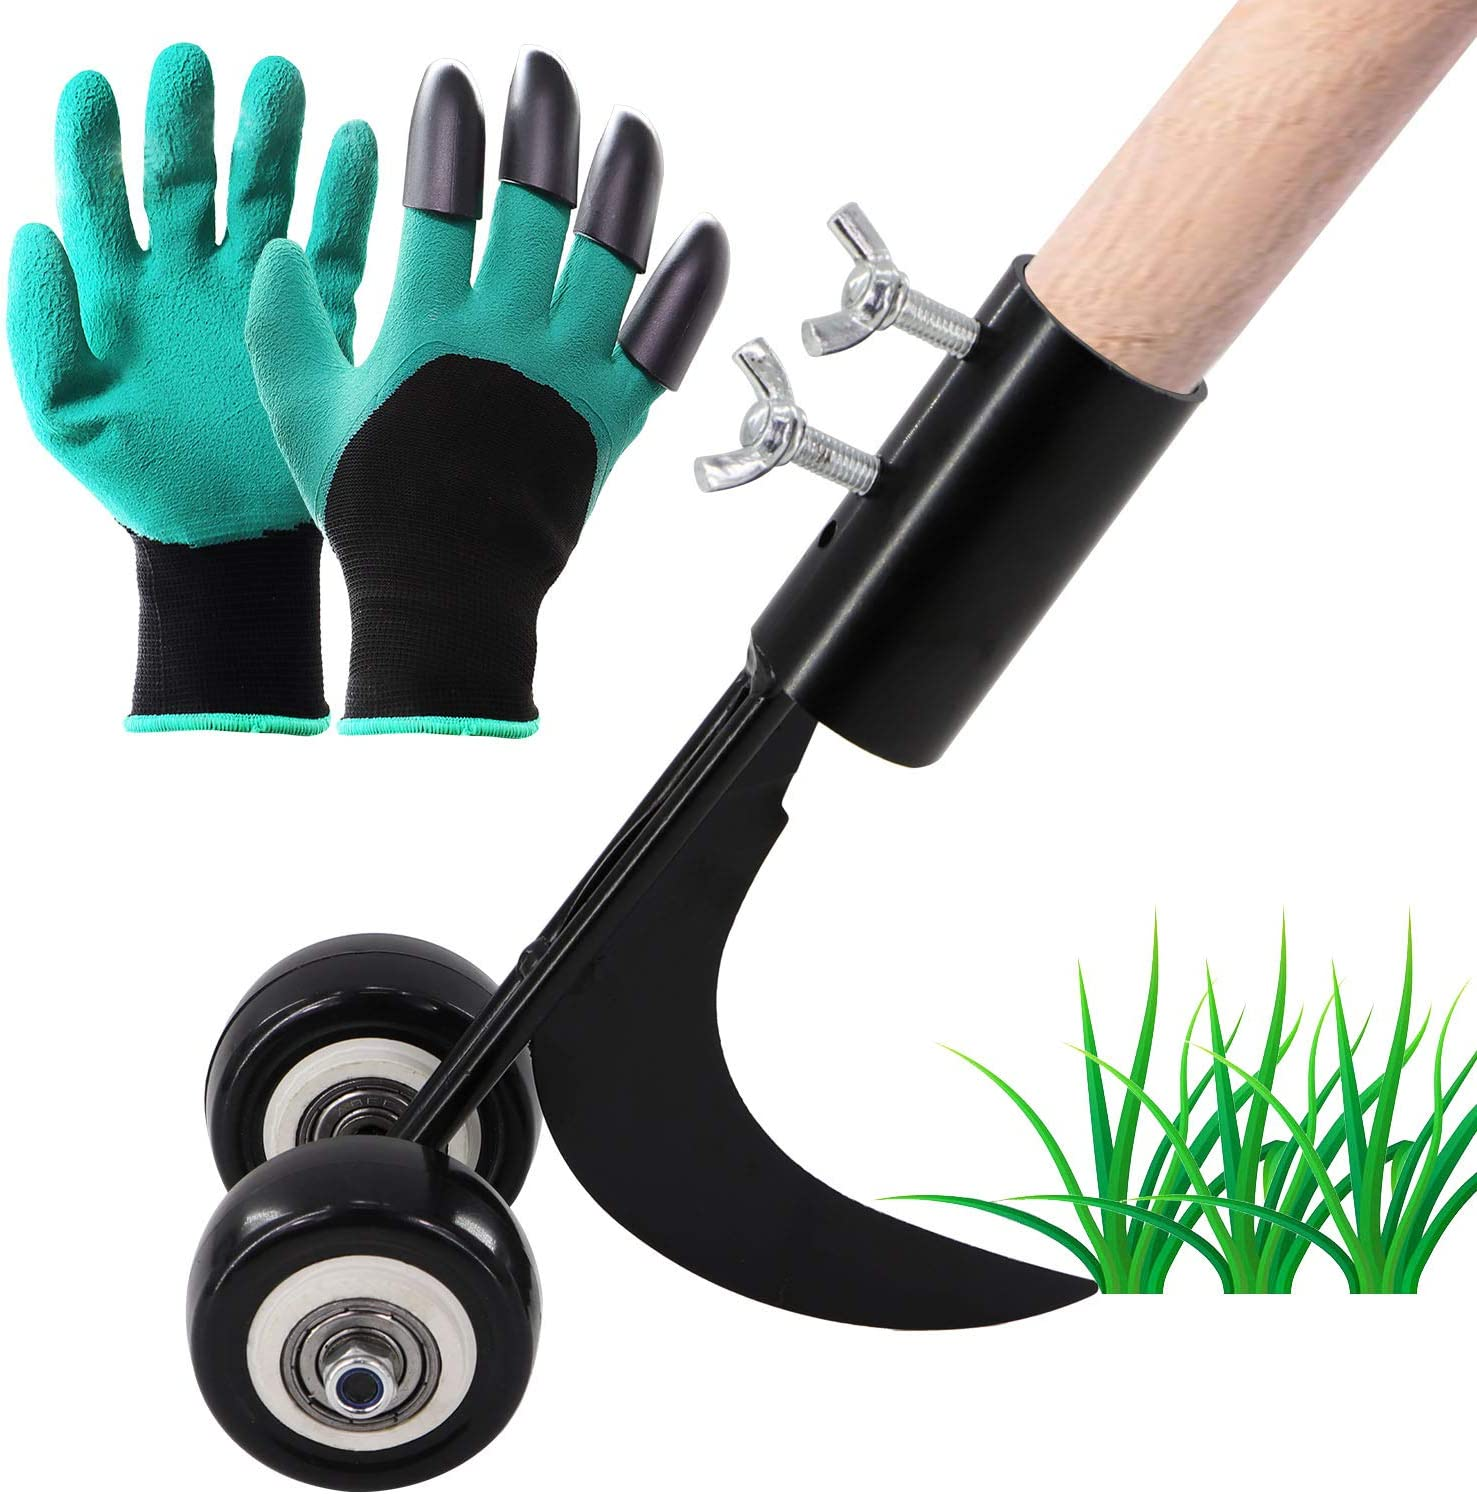 Wistwoxxon Crevice Weeder, Manual Weeder with 1 Pair Garden Gloves, Gap Weeder Tool for Garden, Hand Weeder Tool Without Rod, Wheel Type Weeding Tools, Sickle Hook